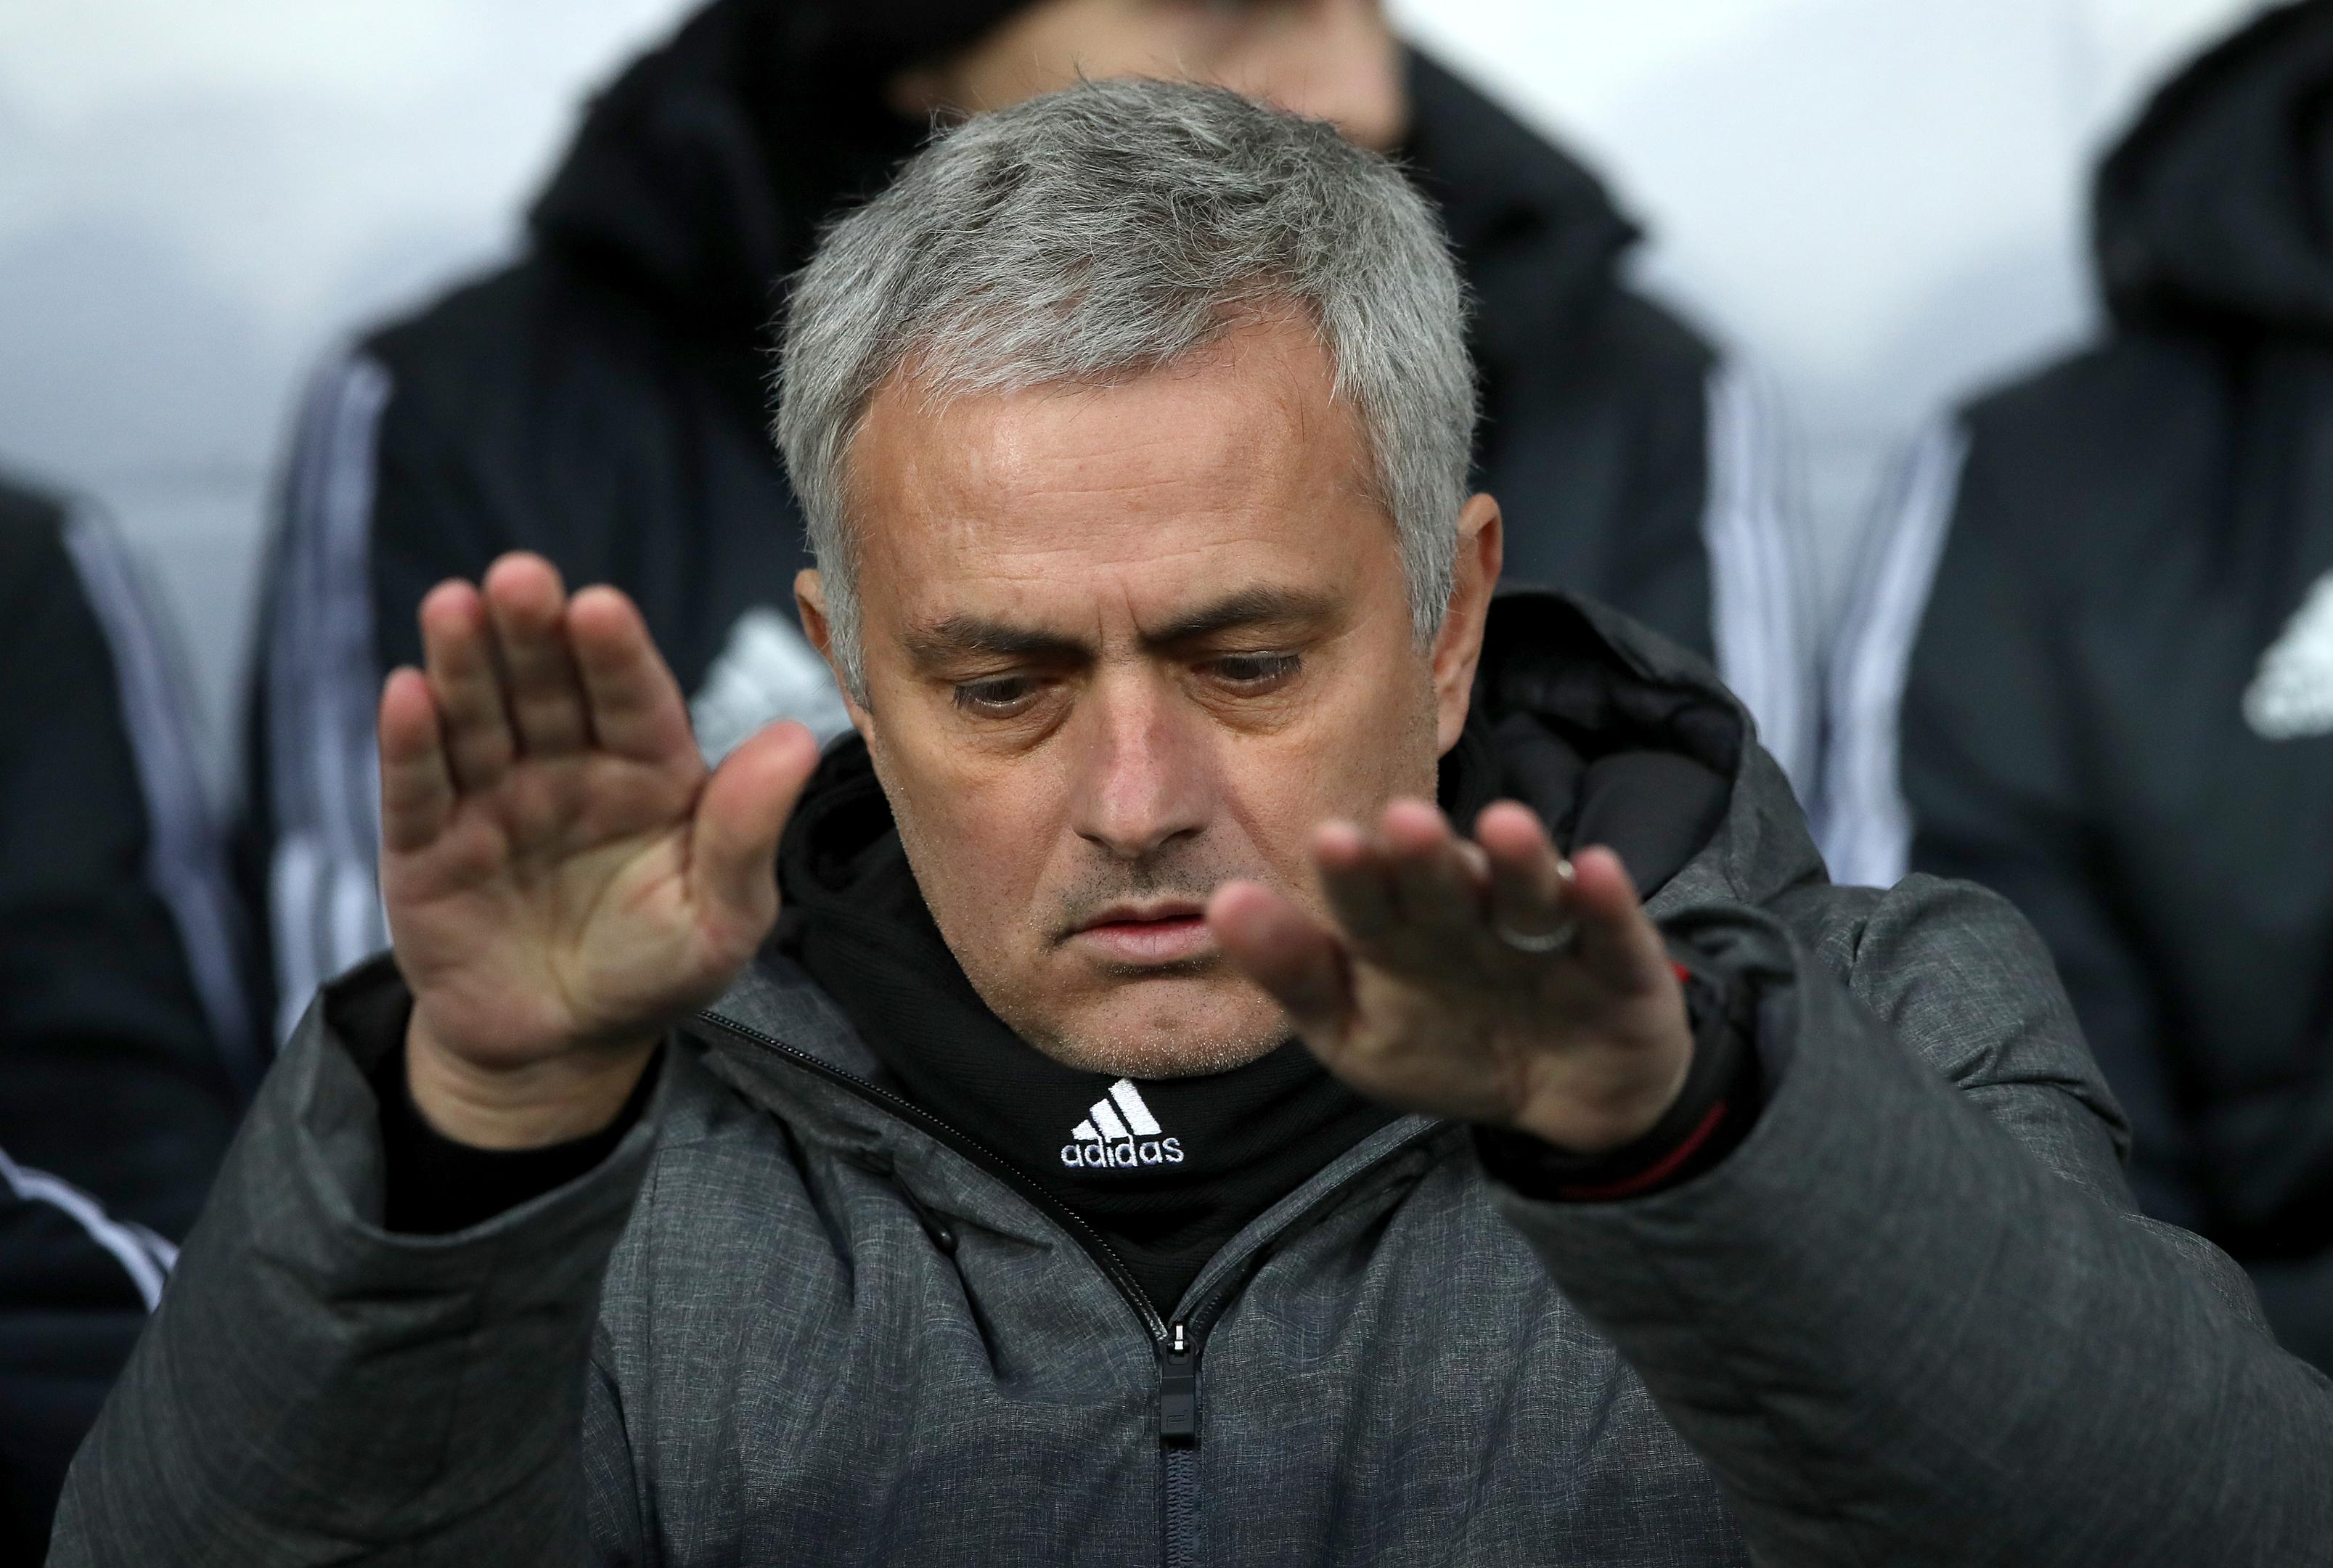 Manchester United manager Jose Mourinho (PA)